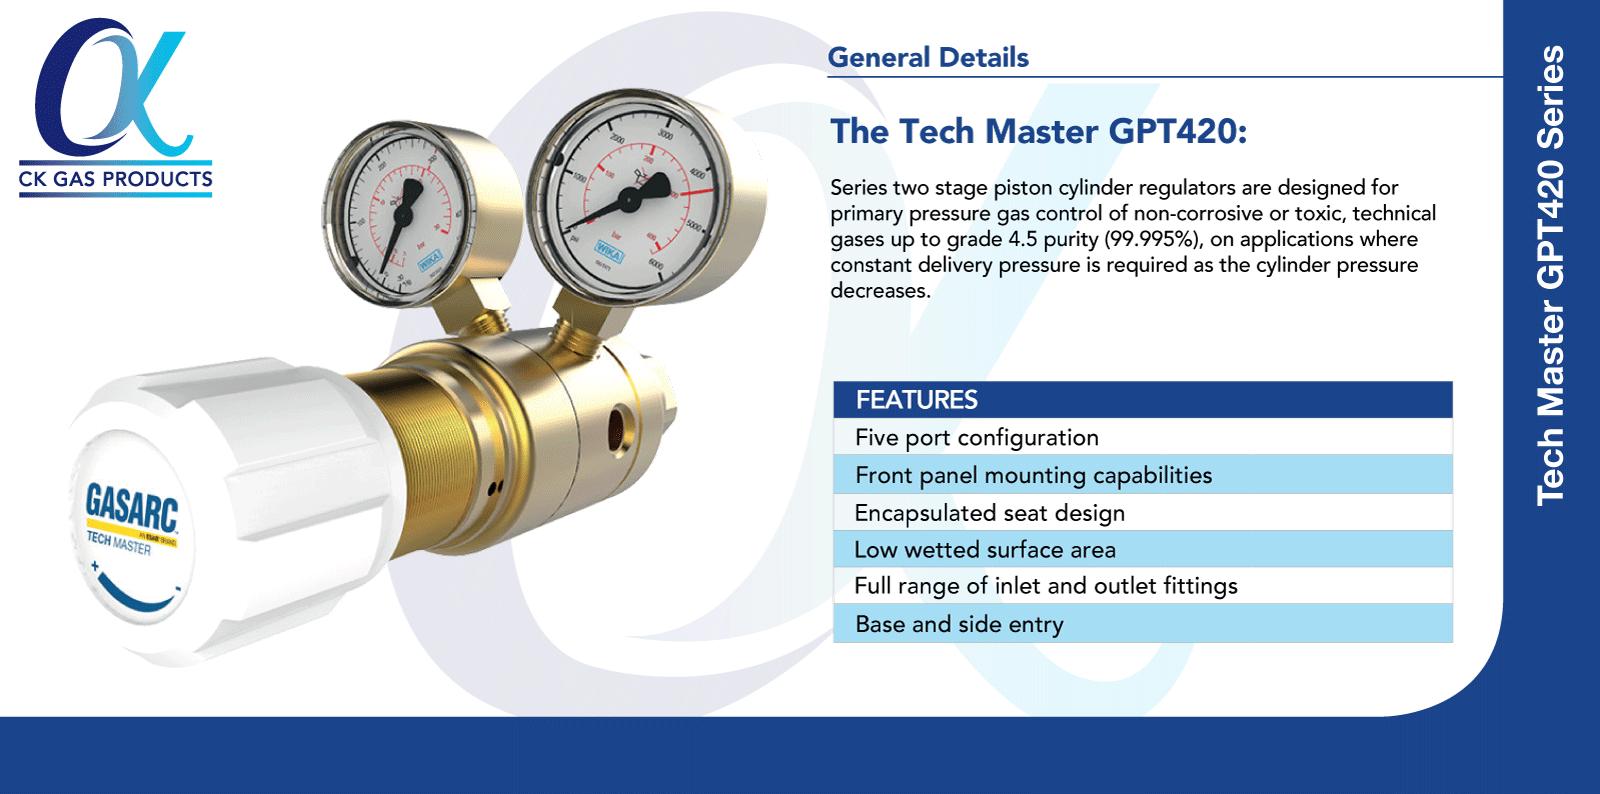 TechMaster_GPT420